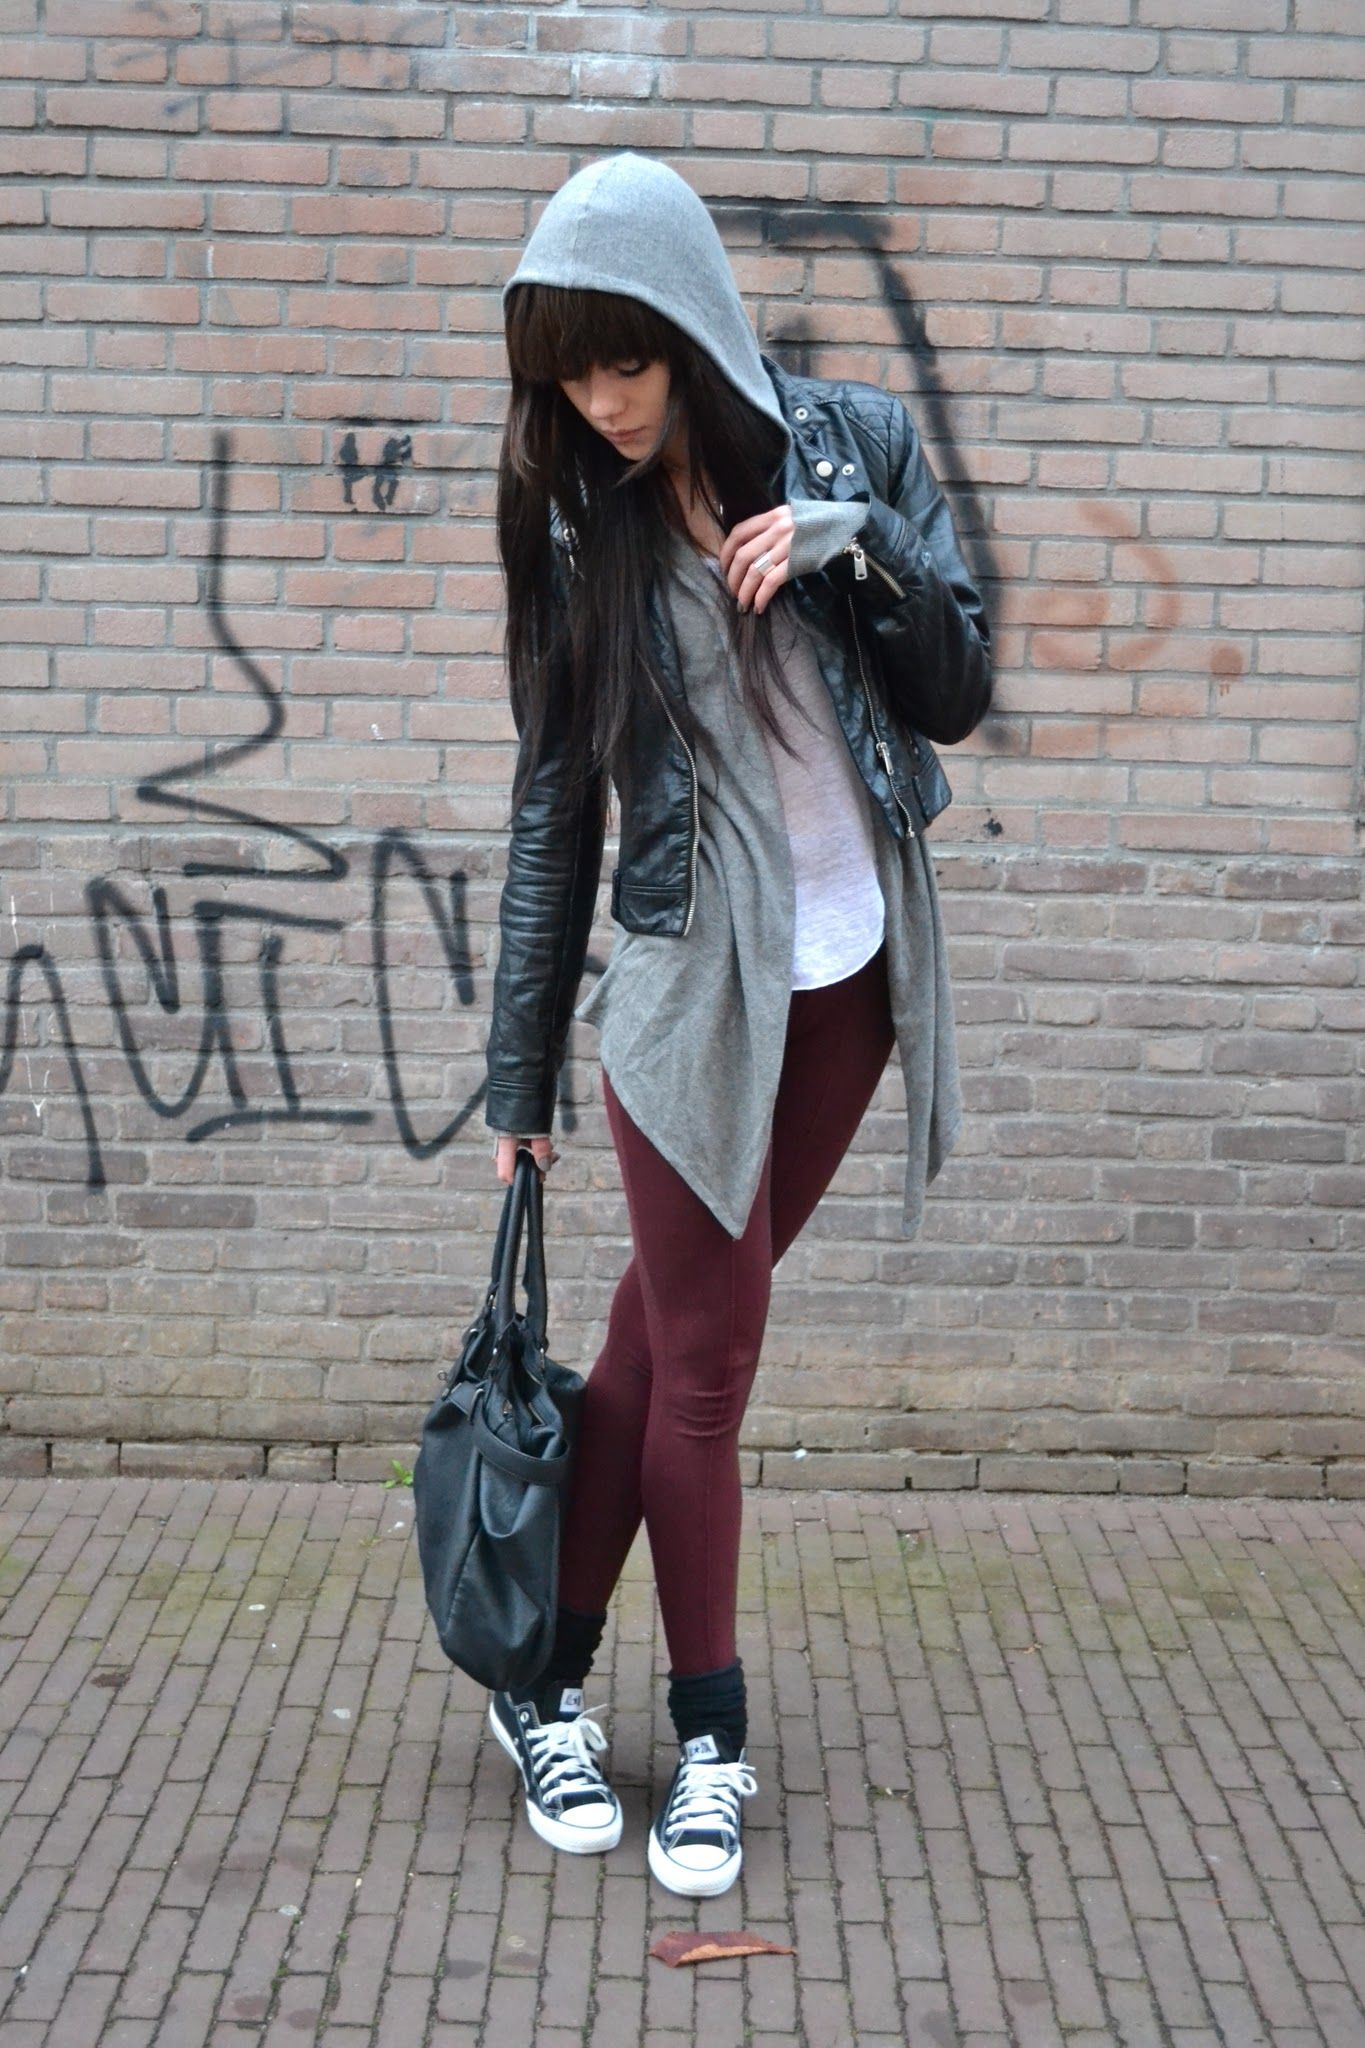 Burgundy leggings + Leather jacket in 2019 Fashion